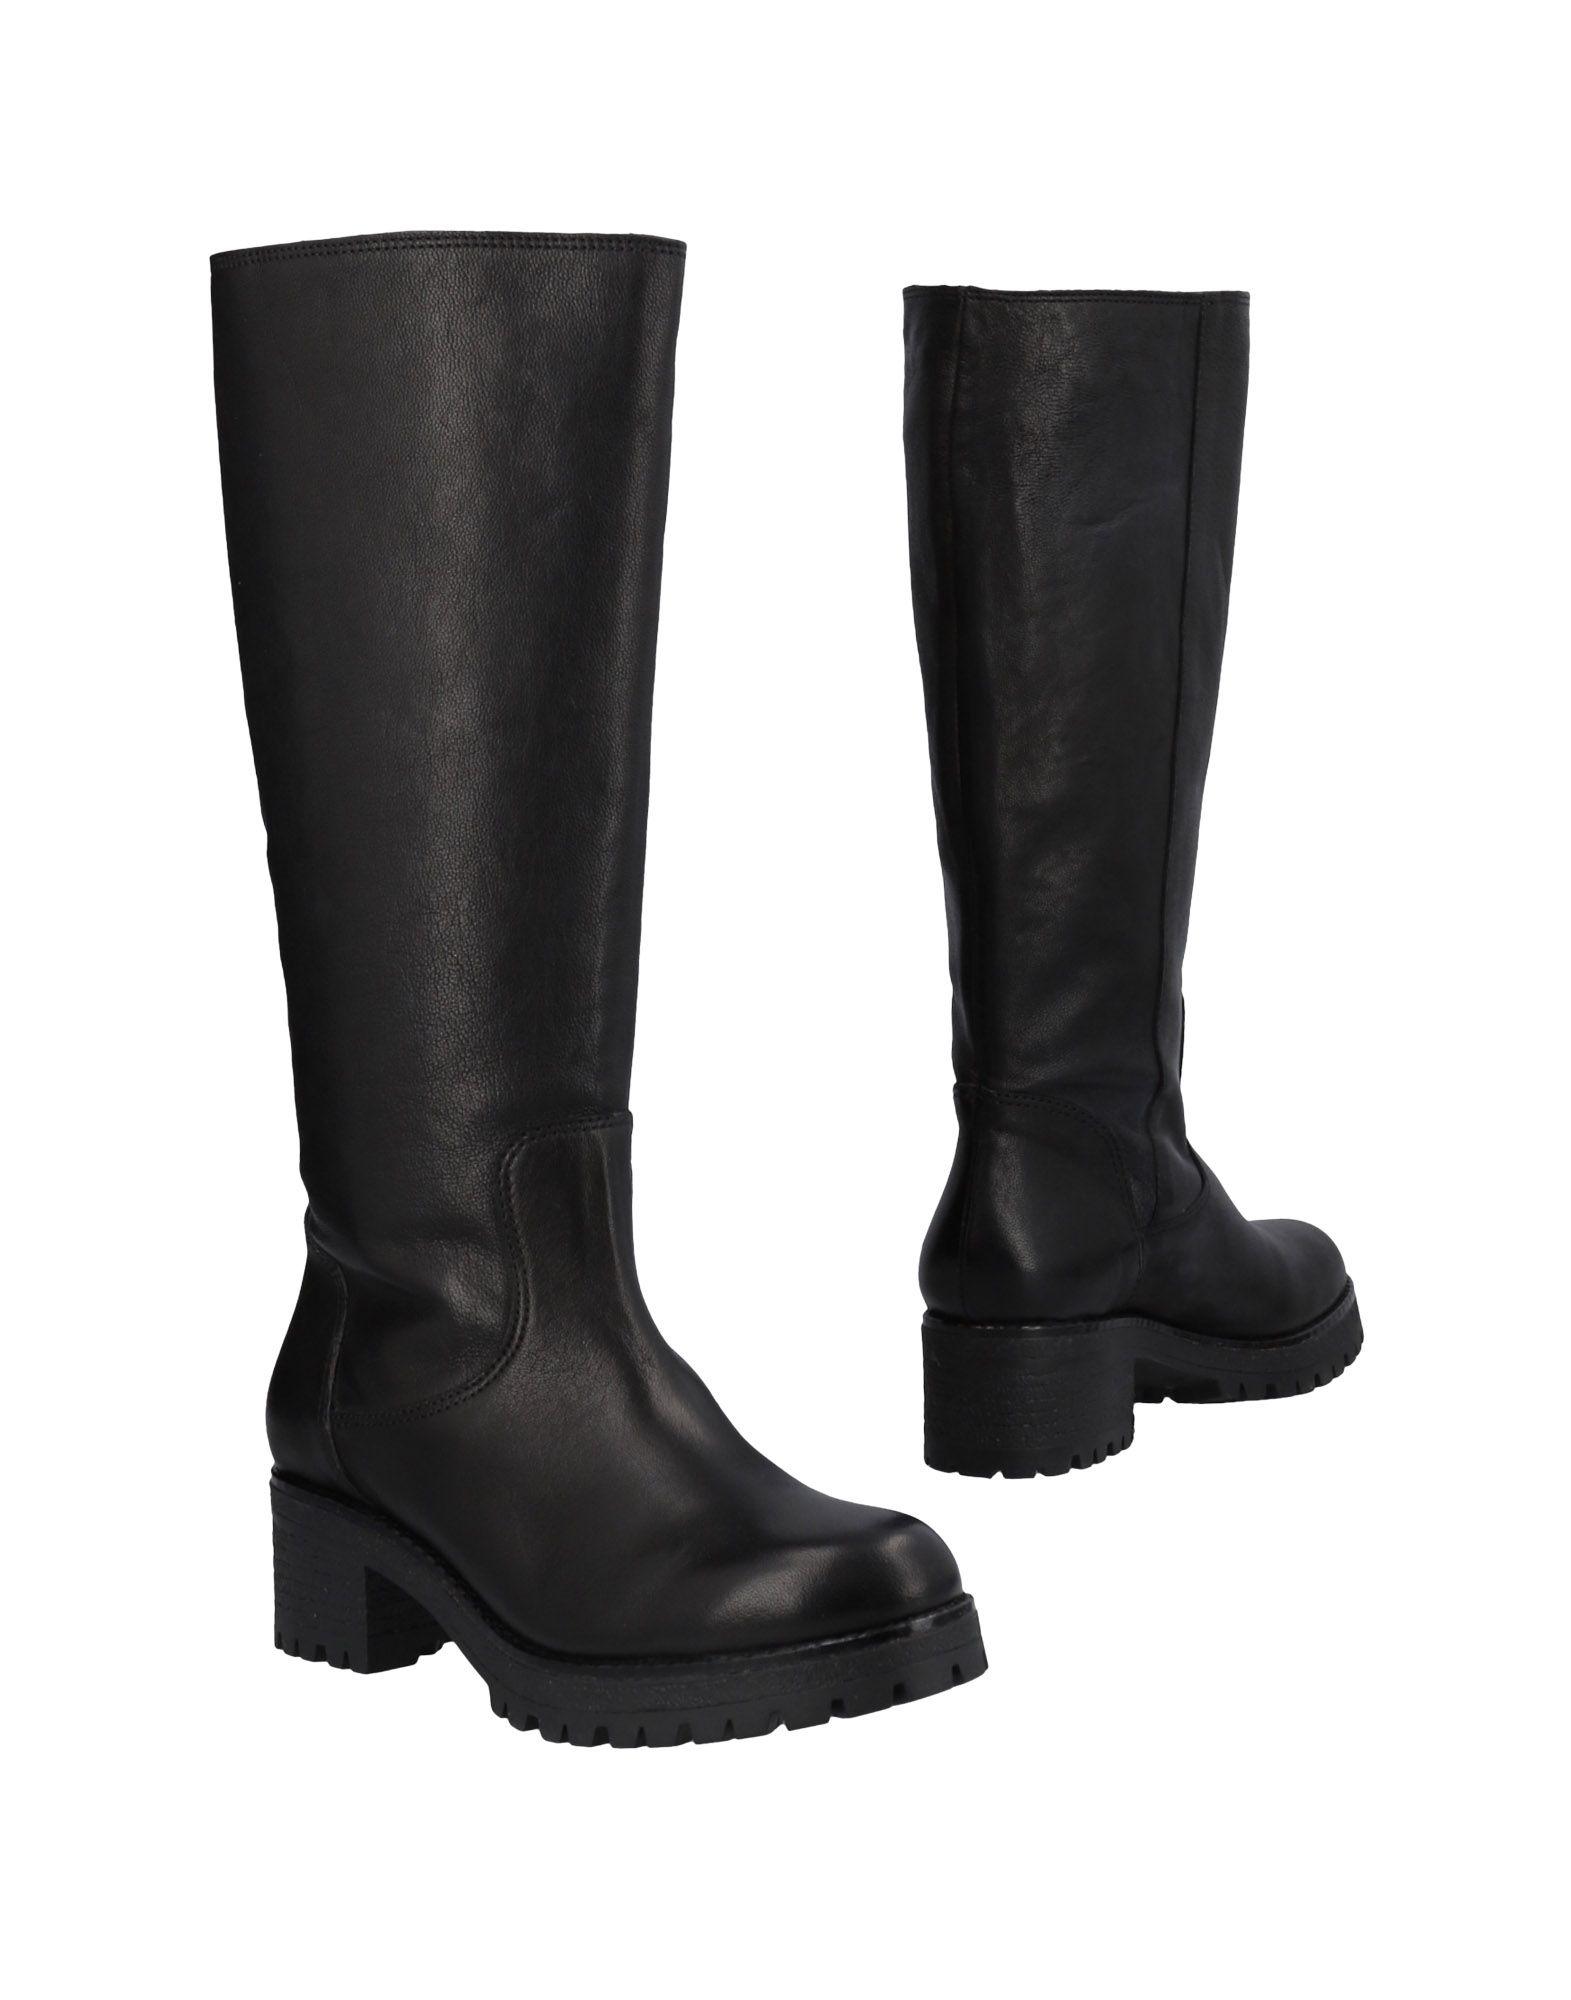 P.A.R.O.S.H. Stiefel Damen  11488098FGGut aussehende strapazierfähige Schuhe